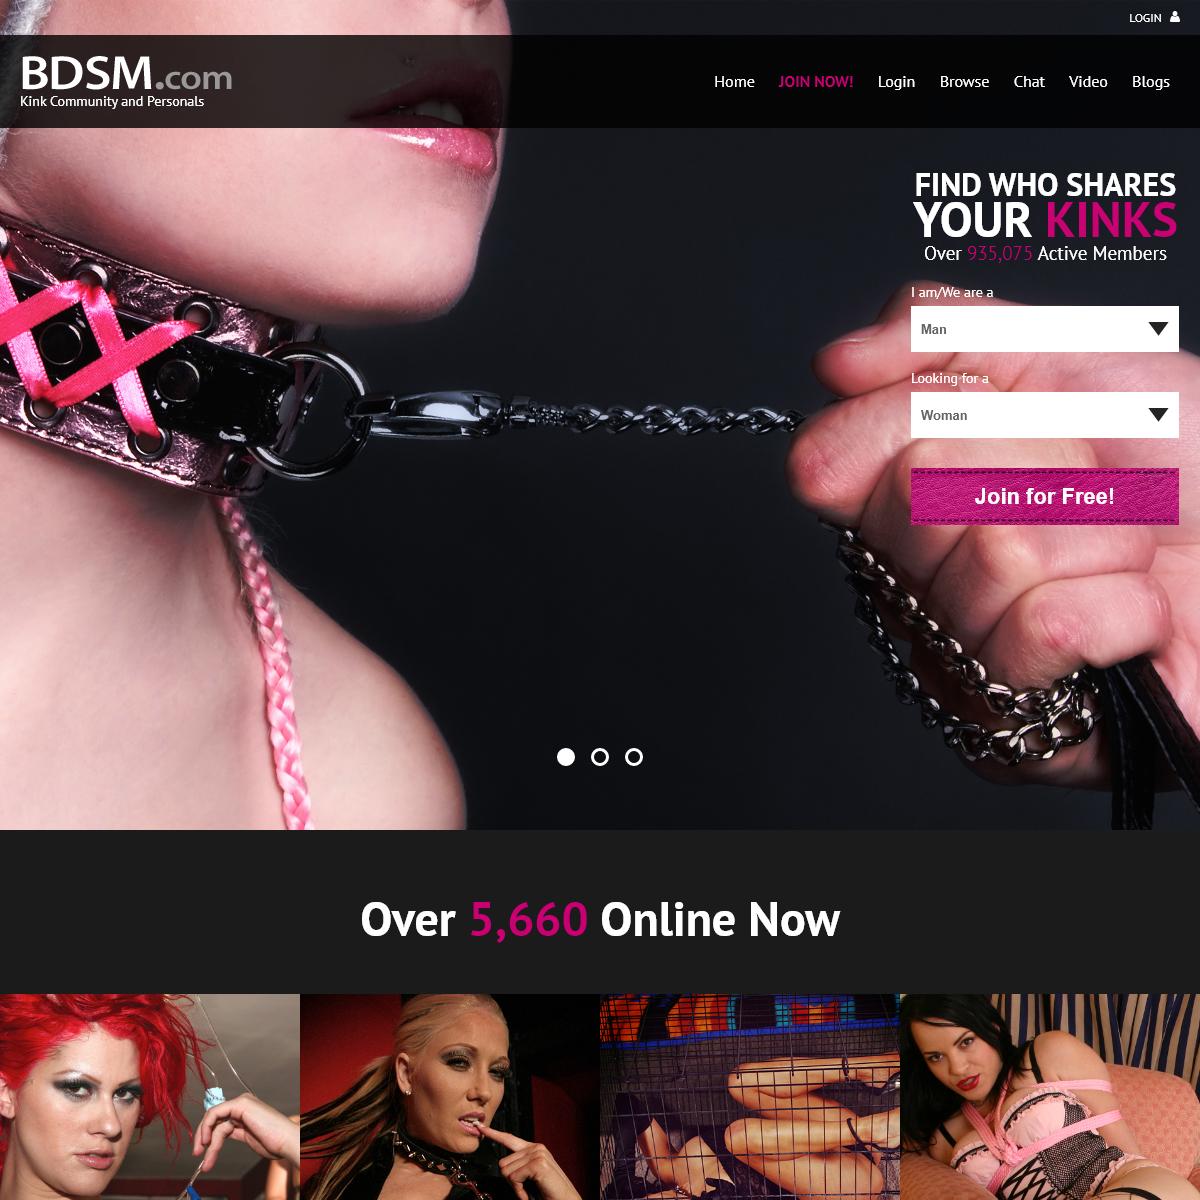 A complete backup of www.www.bdsm.com